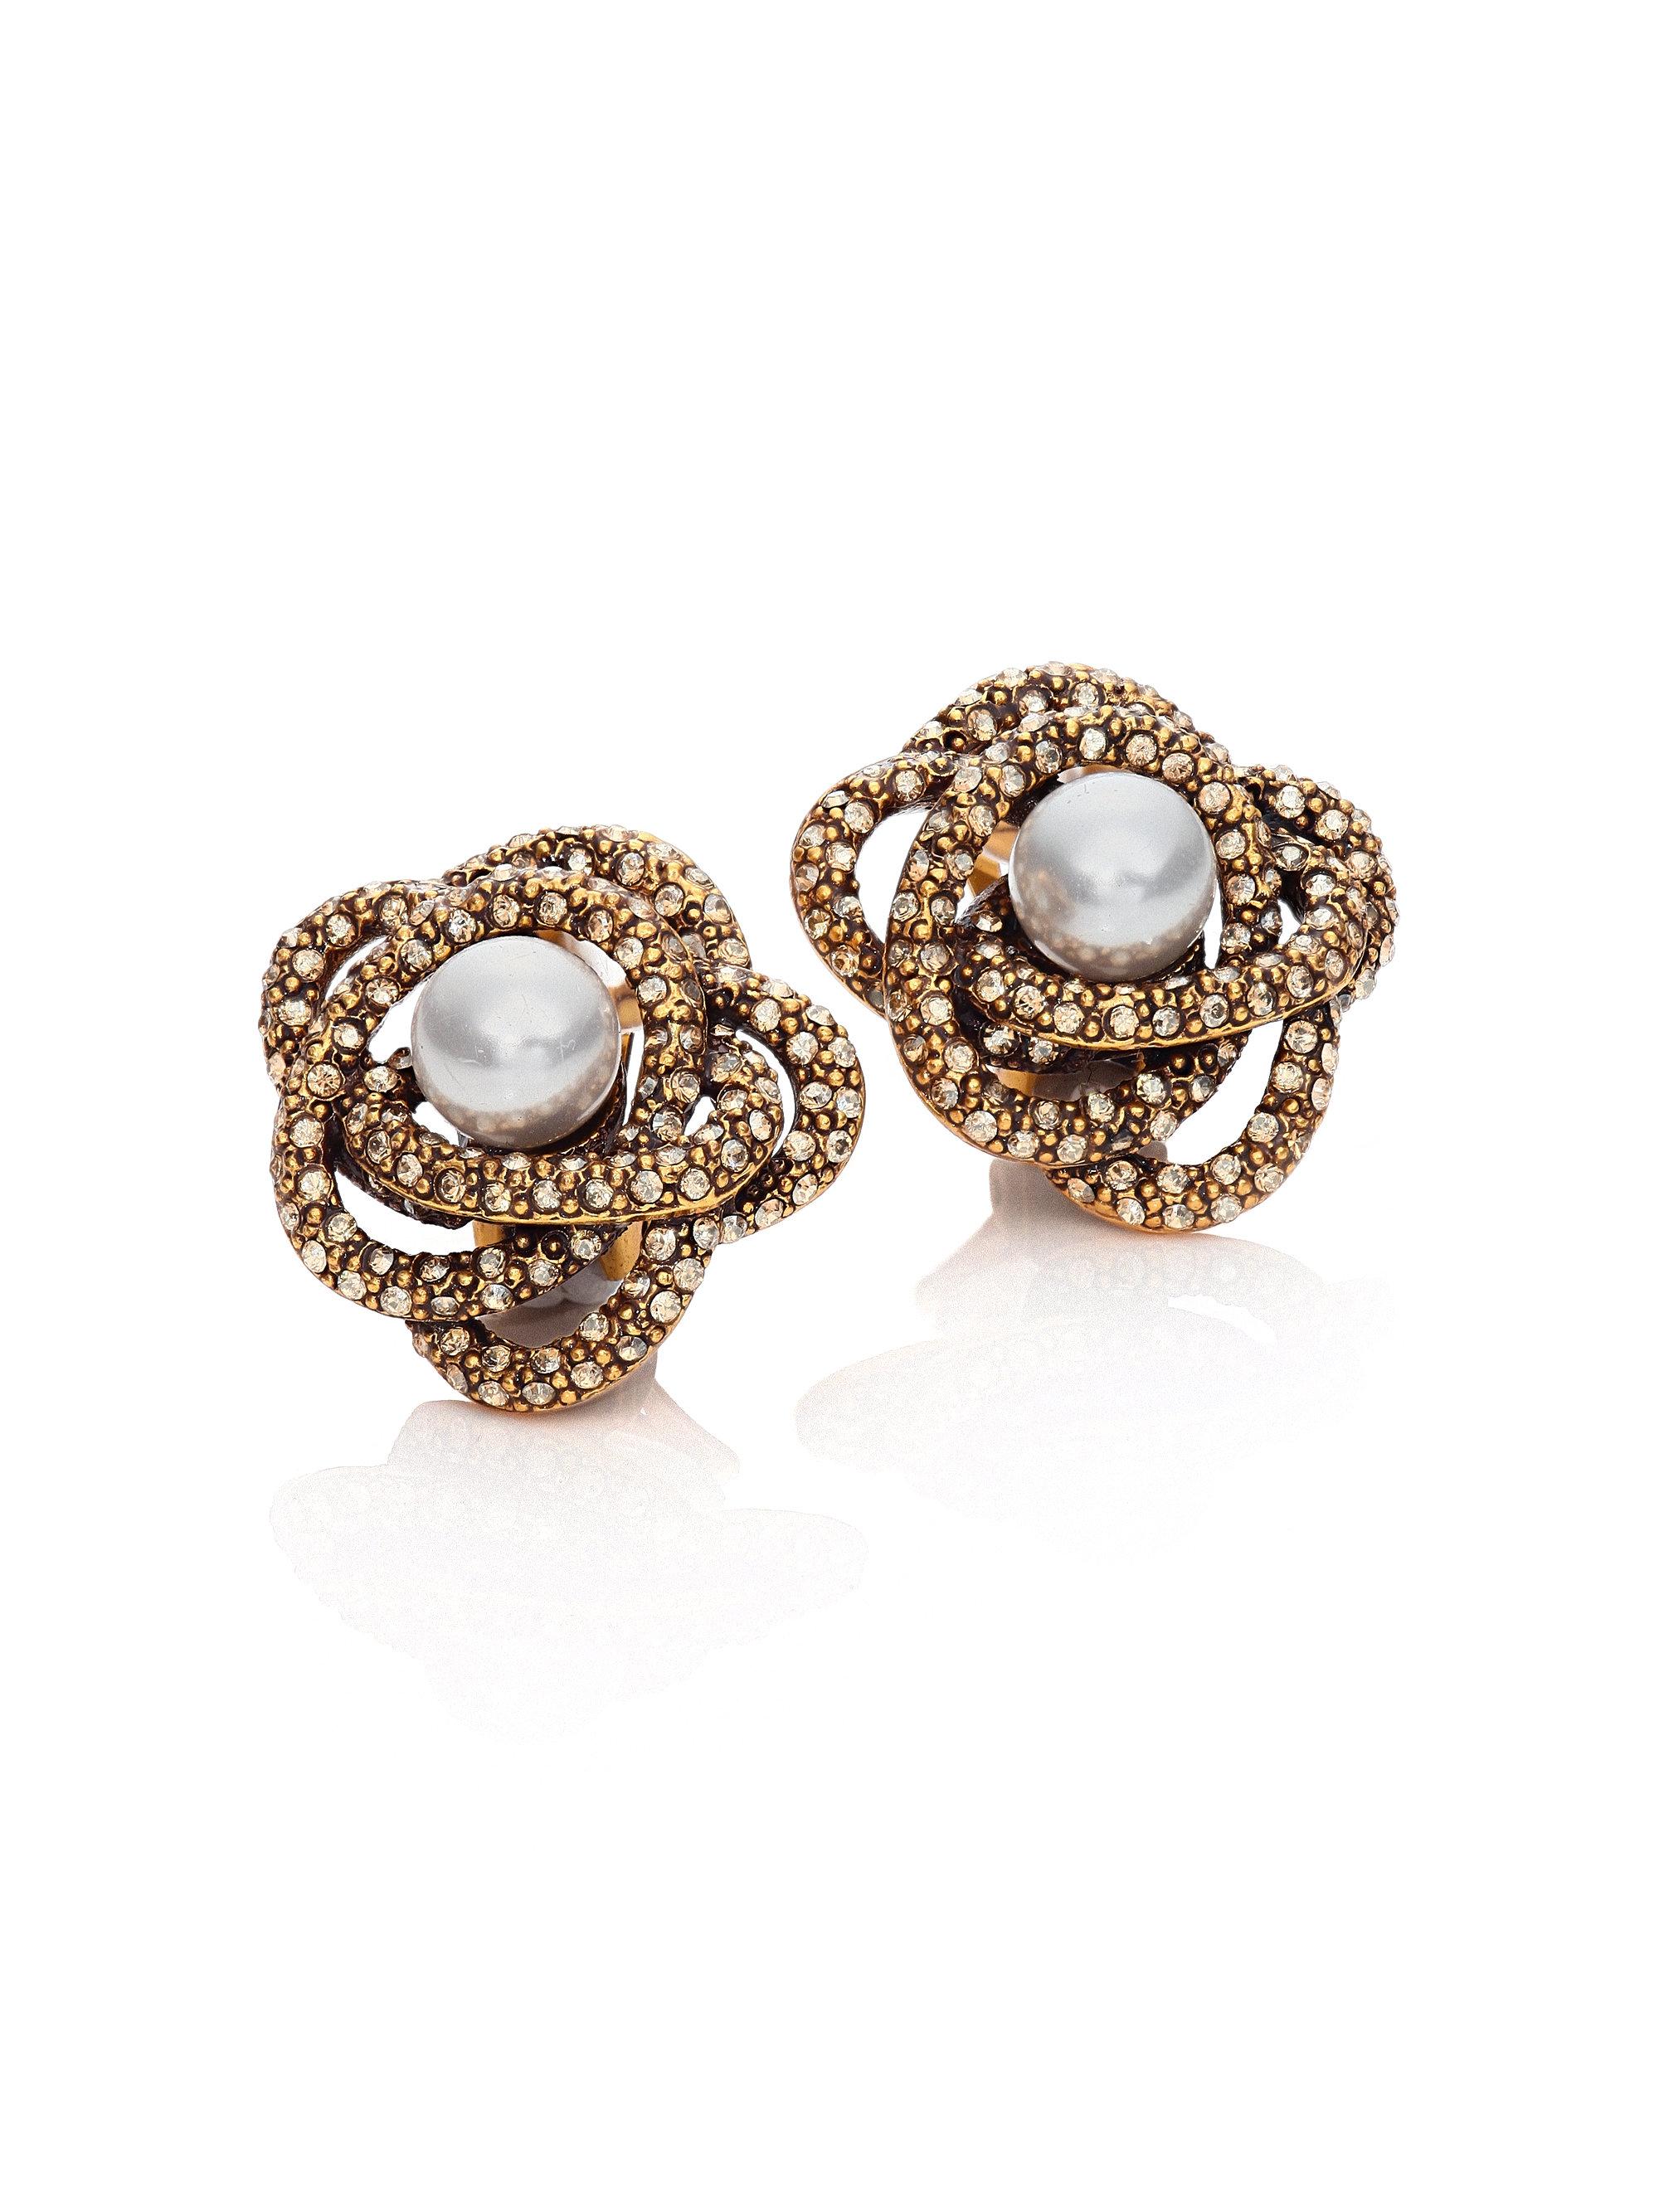 Mens Gold Hoop Earrings Argos Jewelry Flatheadlake3on3